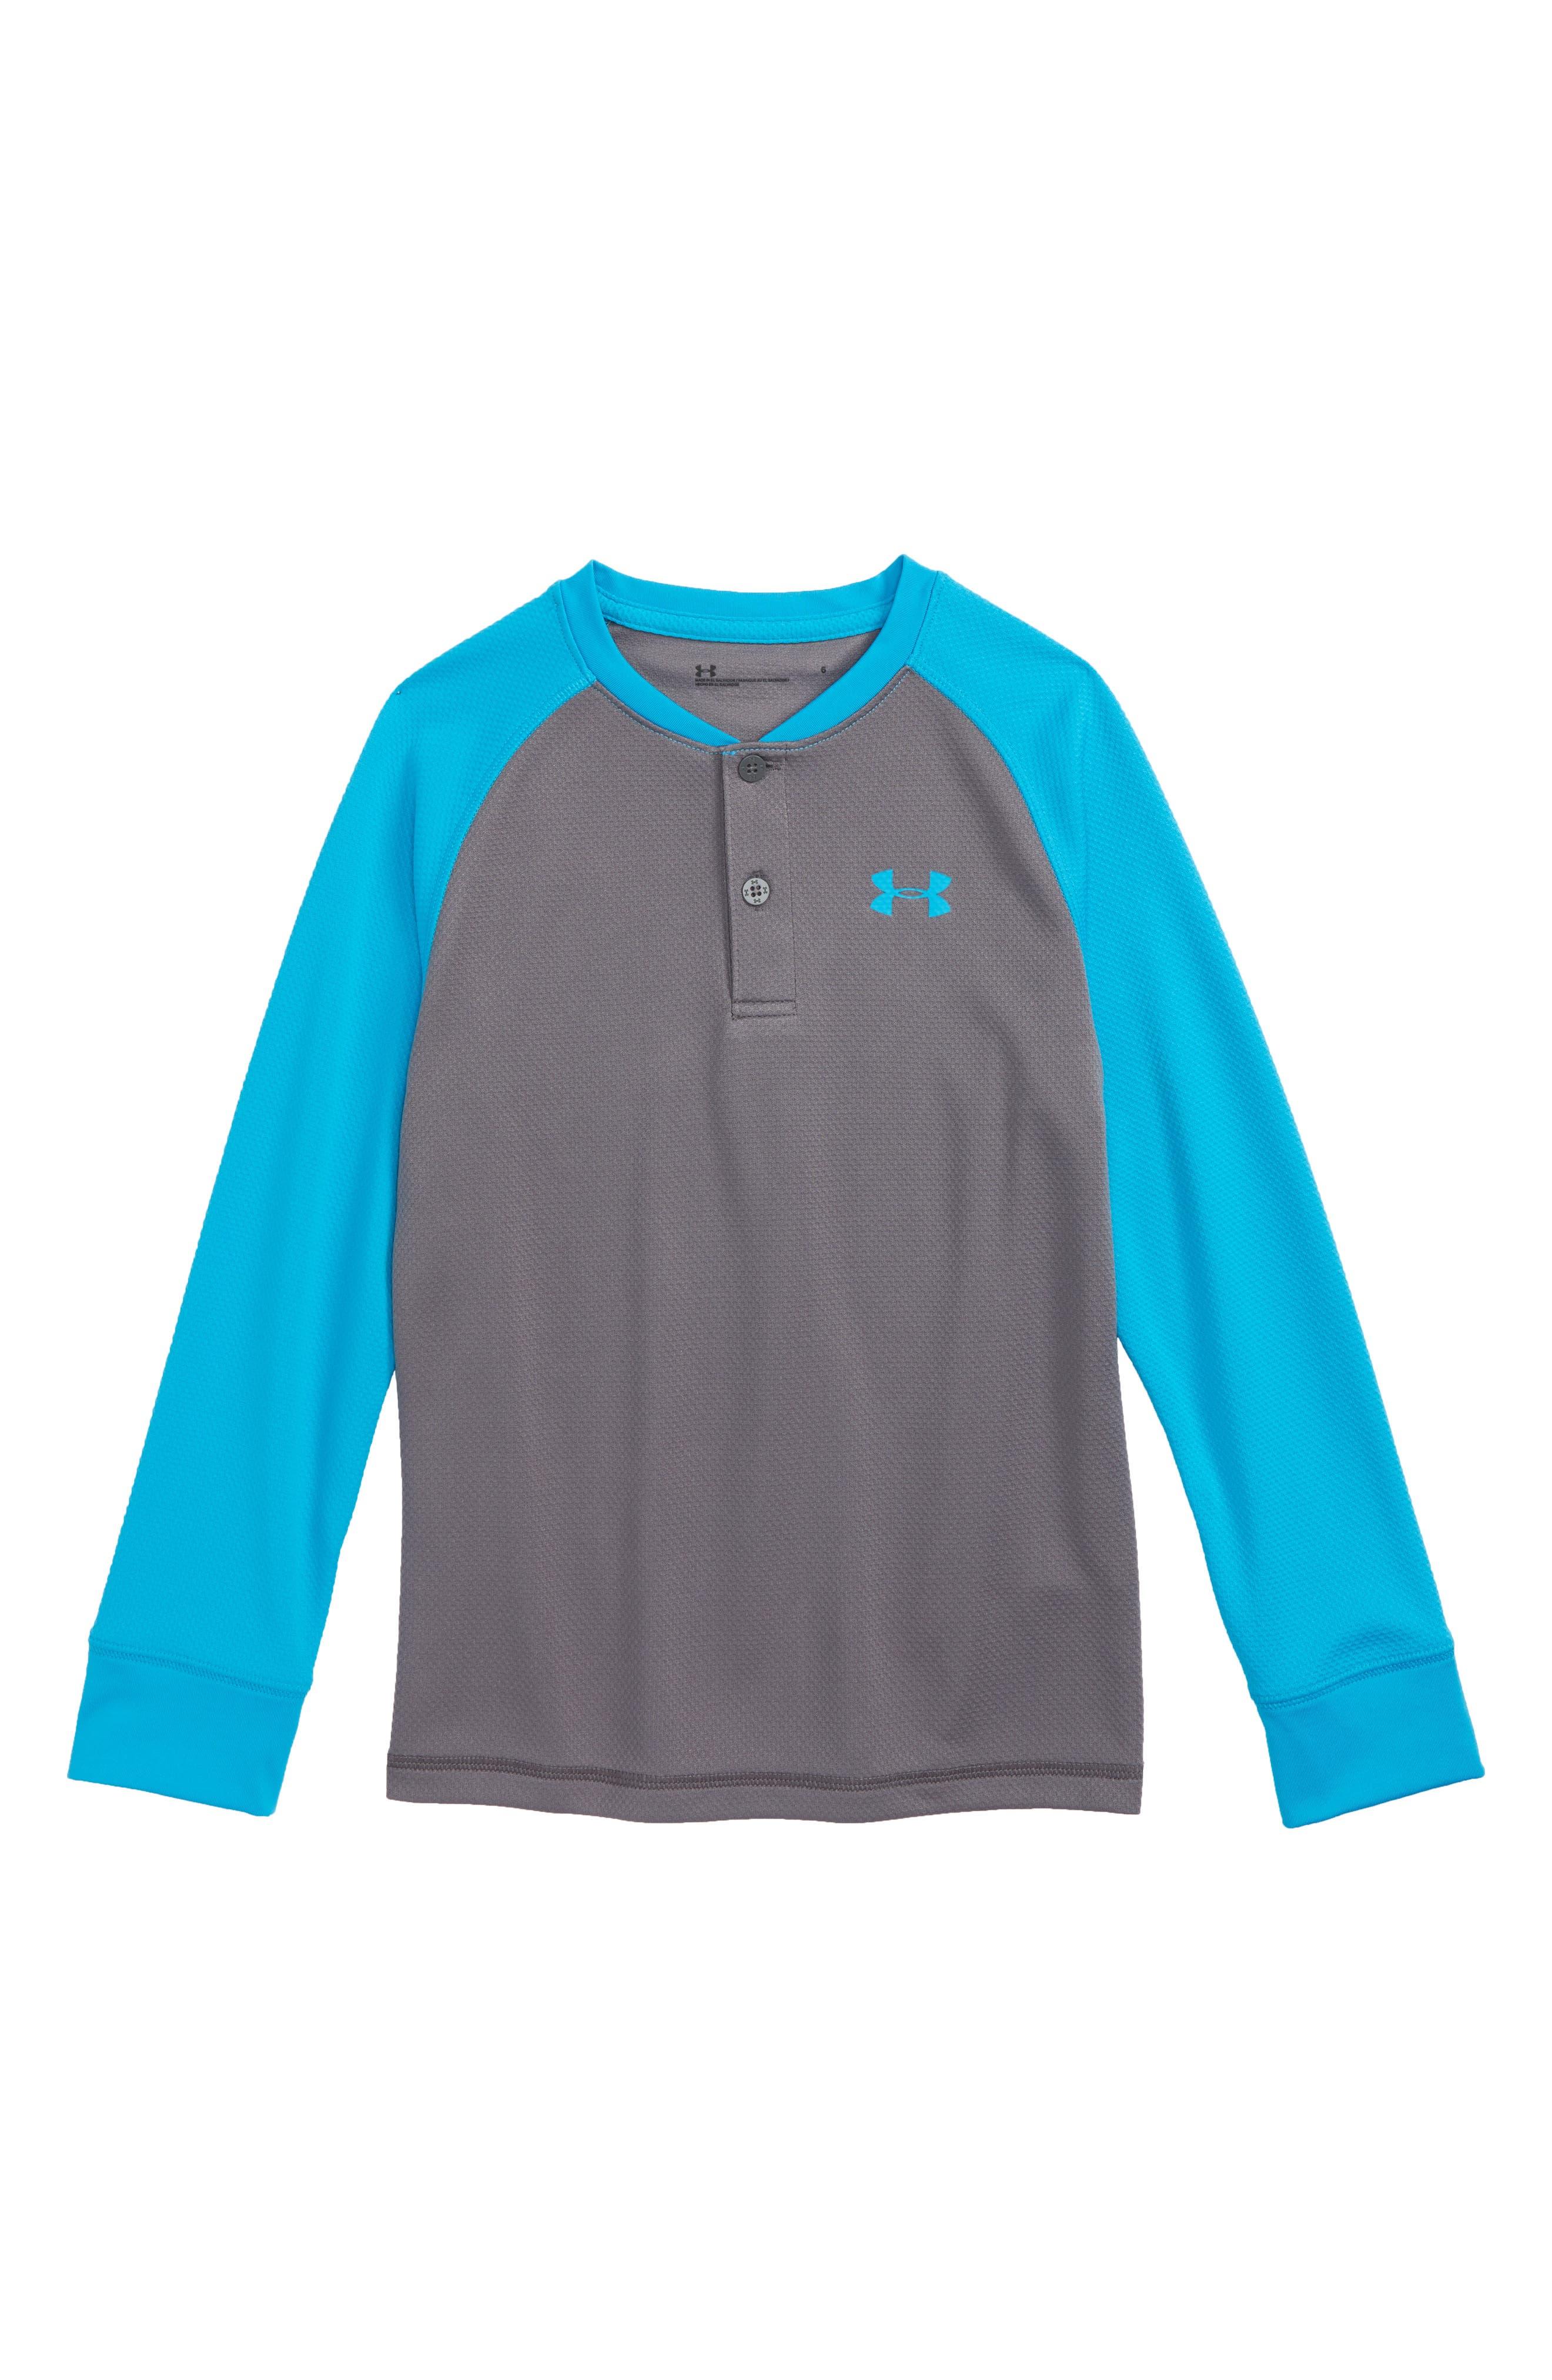 Under Armour Henley T-Shirt (Toddler Boys & Little Boys)